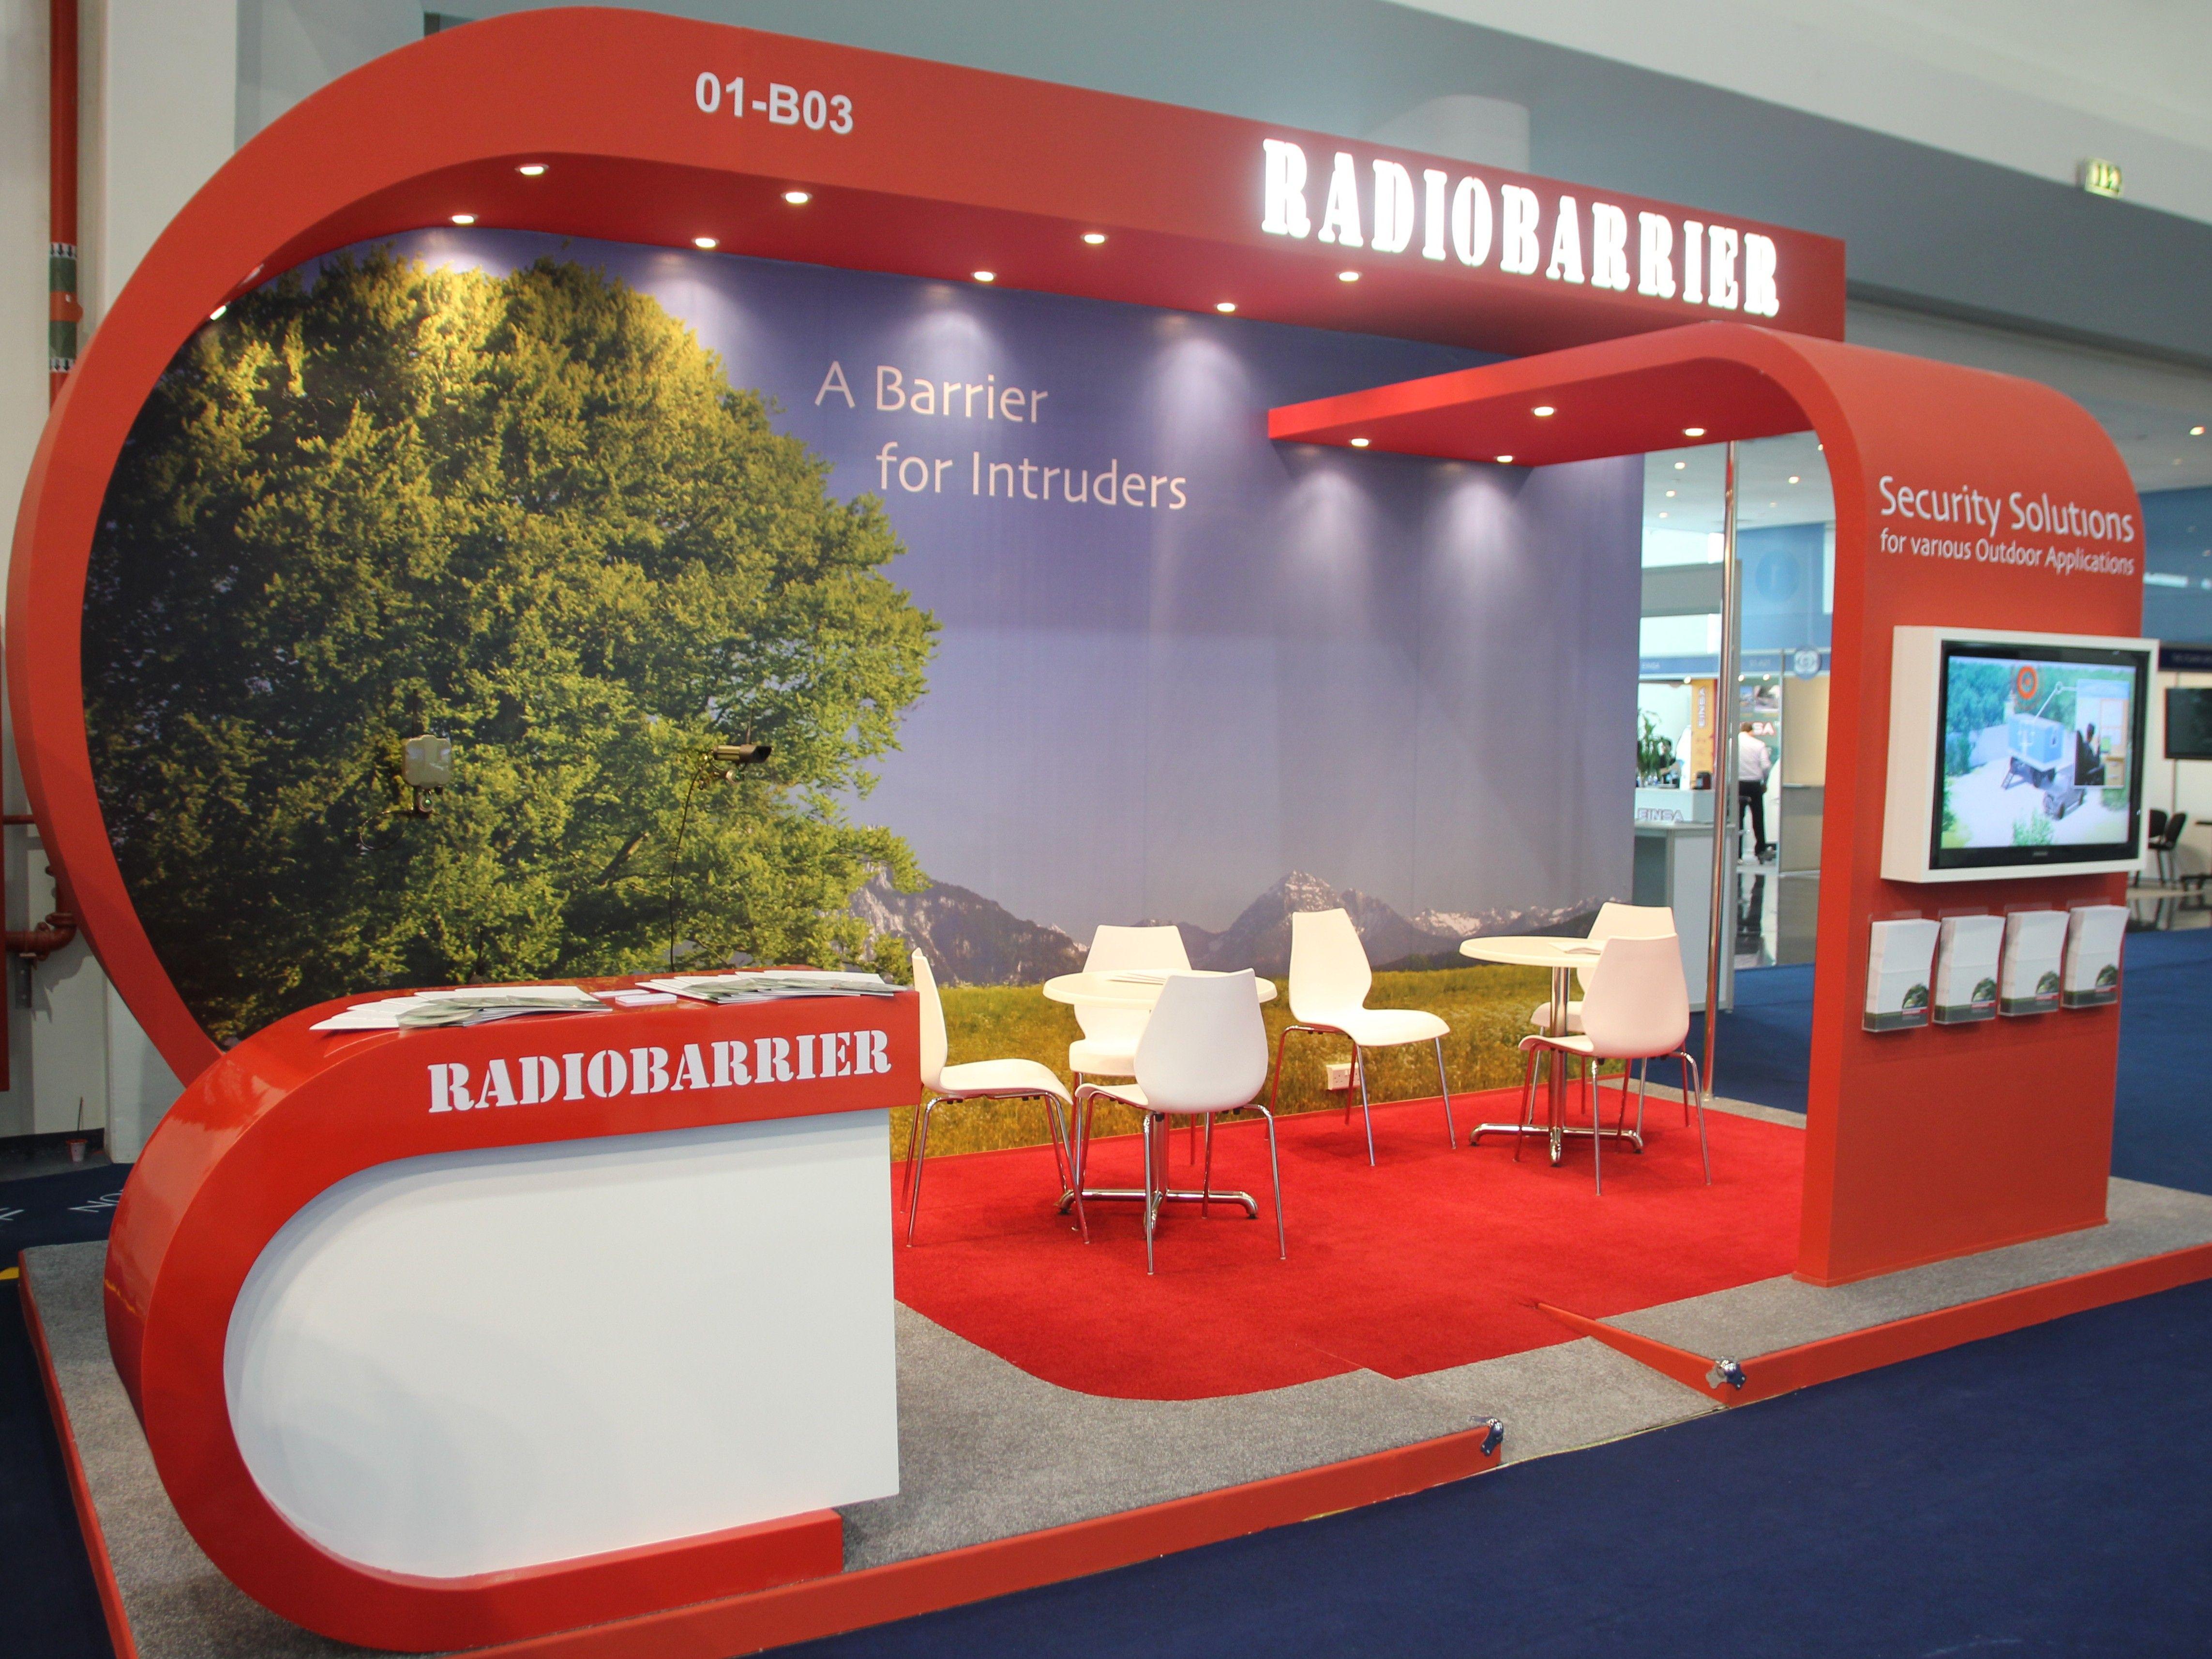 Exhibition Stand Design Abu Dhabi : Radiobarrier stand at international defence exhibition